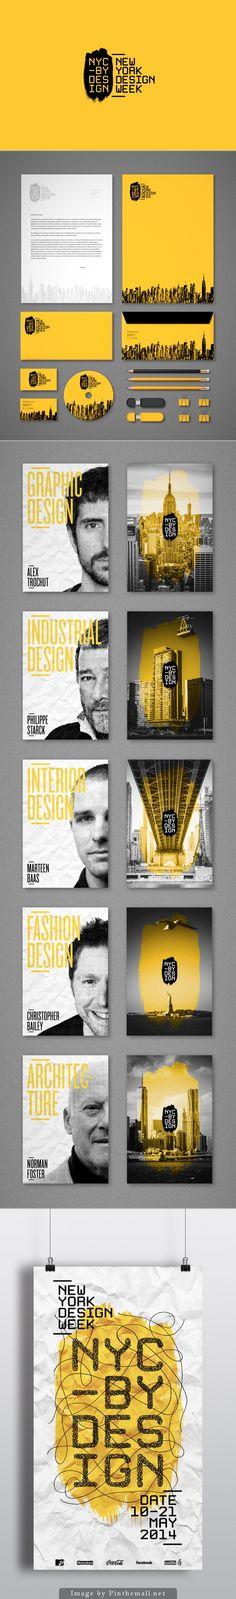 NYCxDesign - New York Design Week by Jous Lara